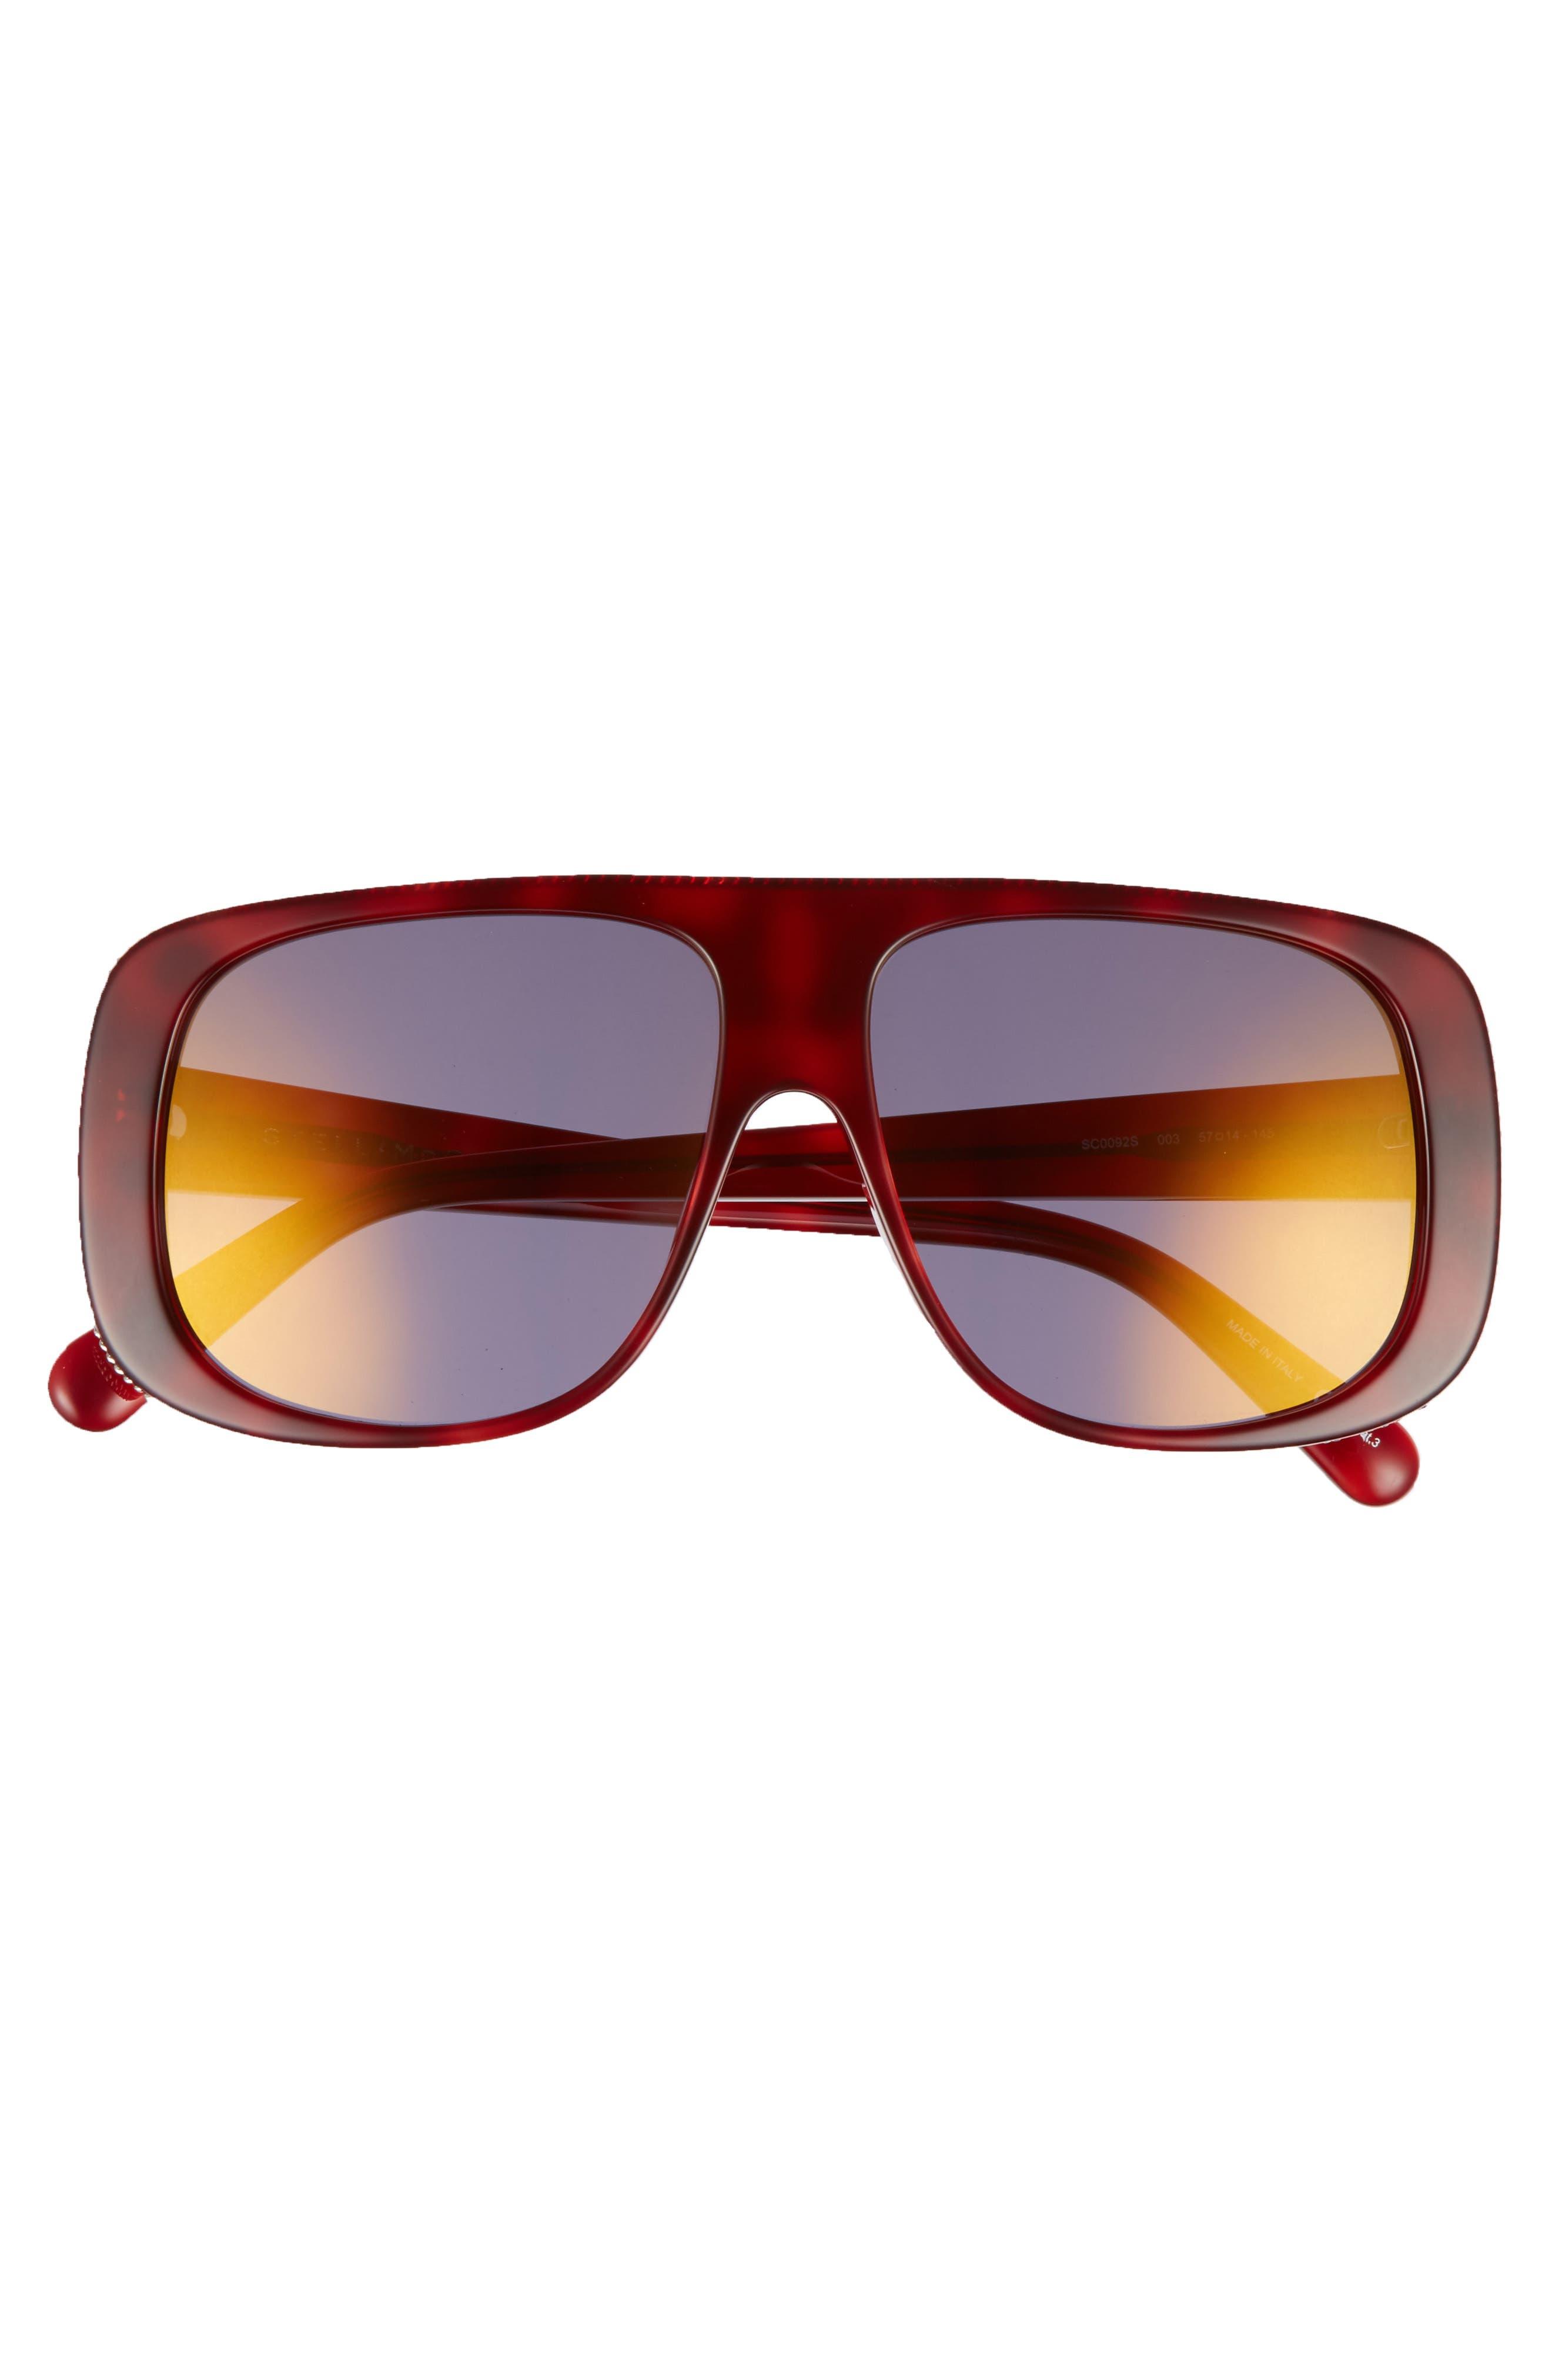 57mm Flat Top Sunglasses,                             Alternate thumbnail 3, color,                             Avana